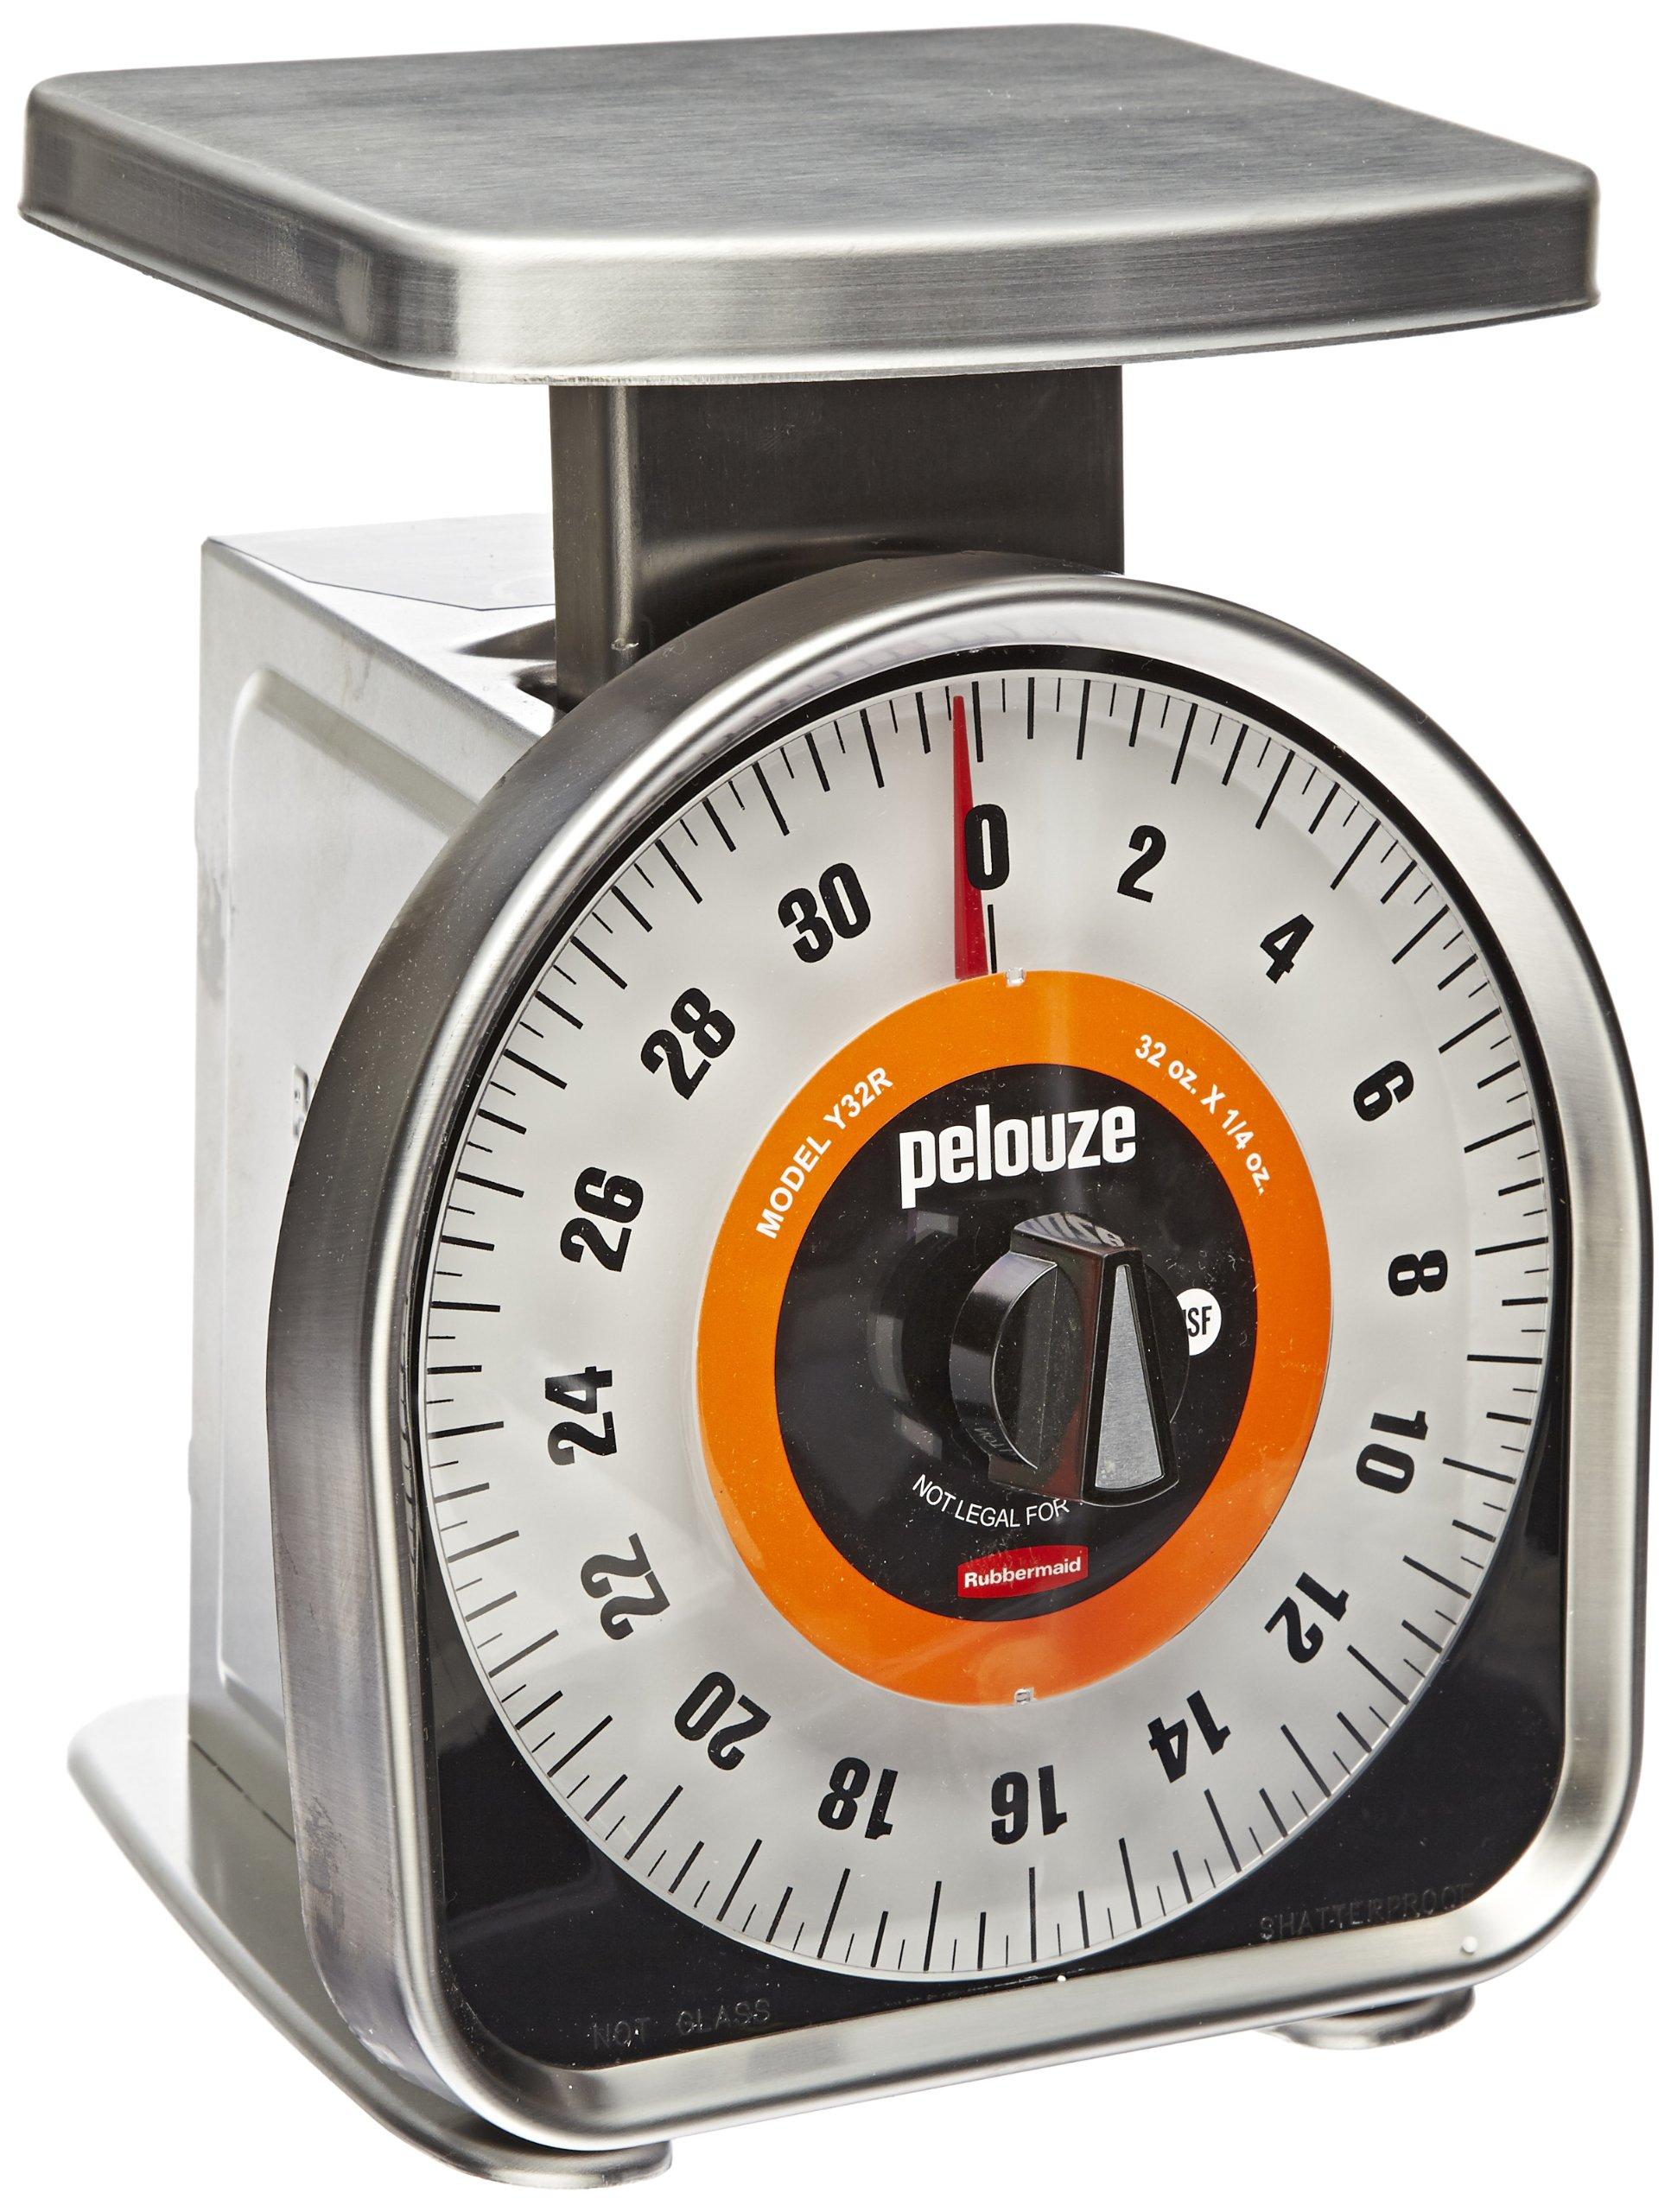 Rubbermaid Commercial Pelouze FGY32R Aluminum Y-Line Mechanical Portion-Control Food Scale, 2-pound by Rubbermaid Commercial Products